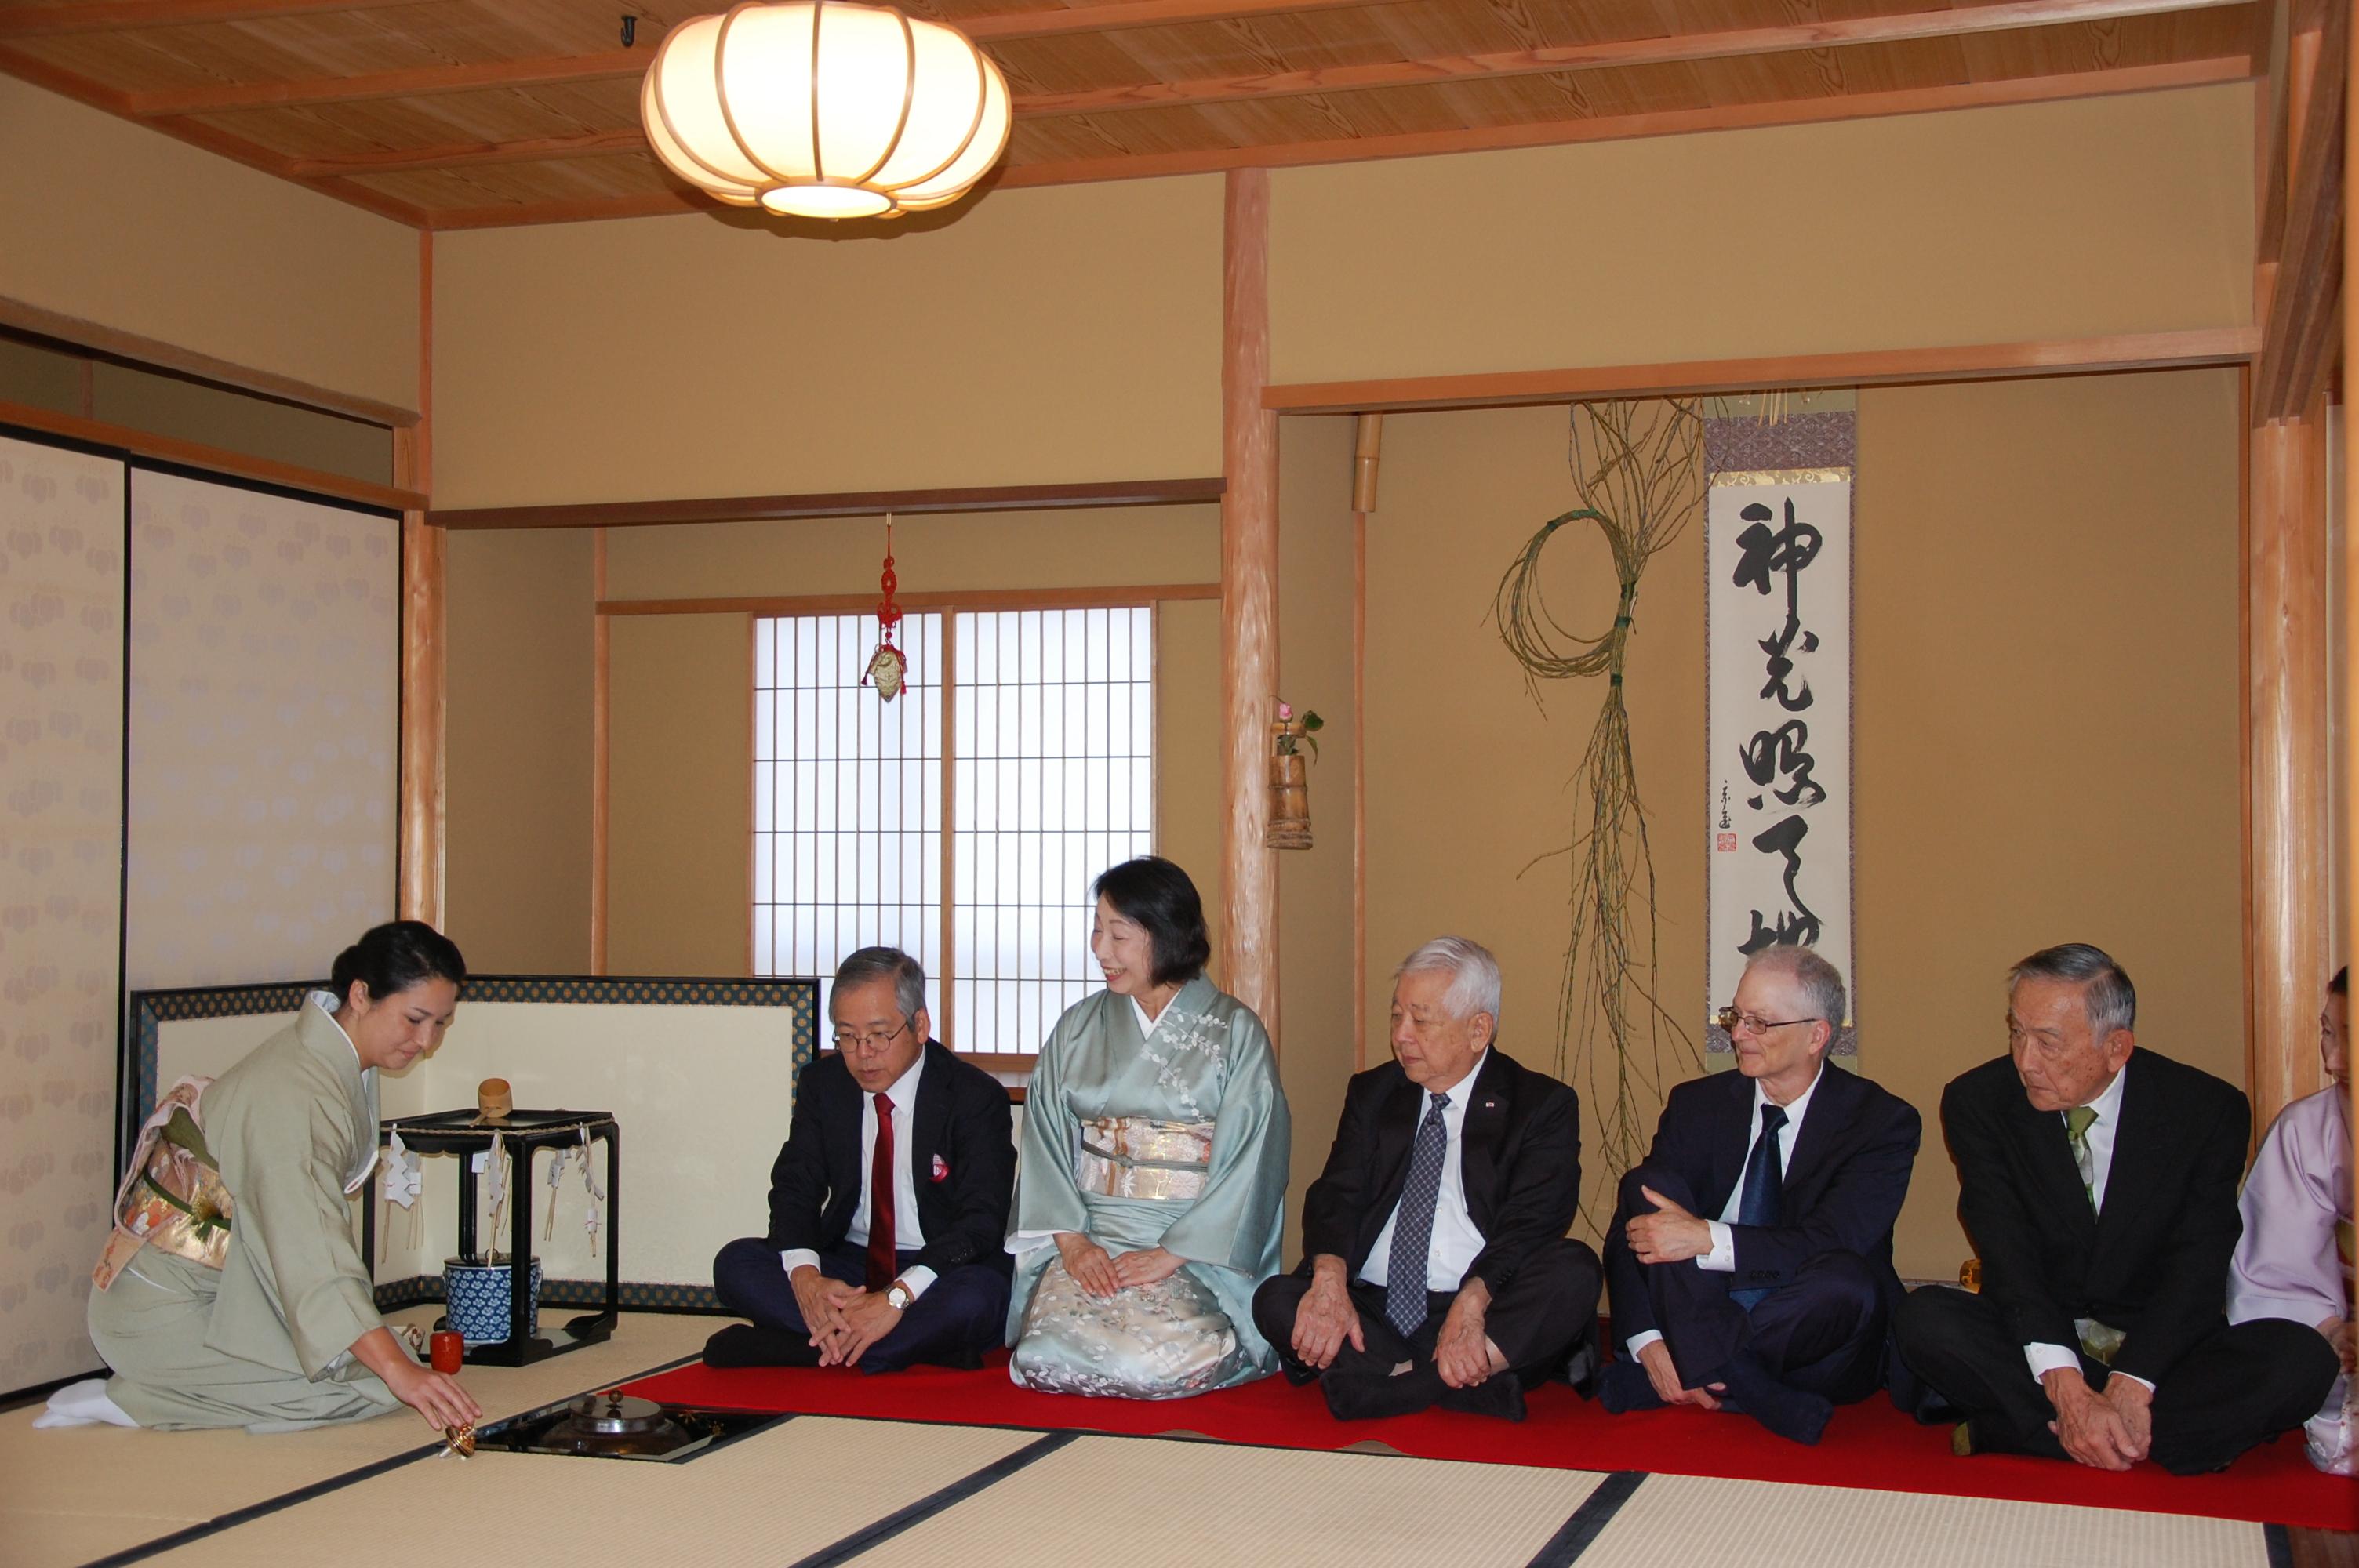 Teishu (tea ceremony host) Kae Pusic-Sanada prepared tea for guests (from left): Consul General Koichi Ito, Mrs. Misako Ito, Dr. Satoru Izutsu, Dr. Robert Huey and Akemi Kurokawa at the Chado Urasenke Tankokai Association's Hatsudate Shiki.